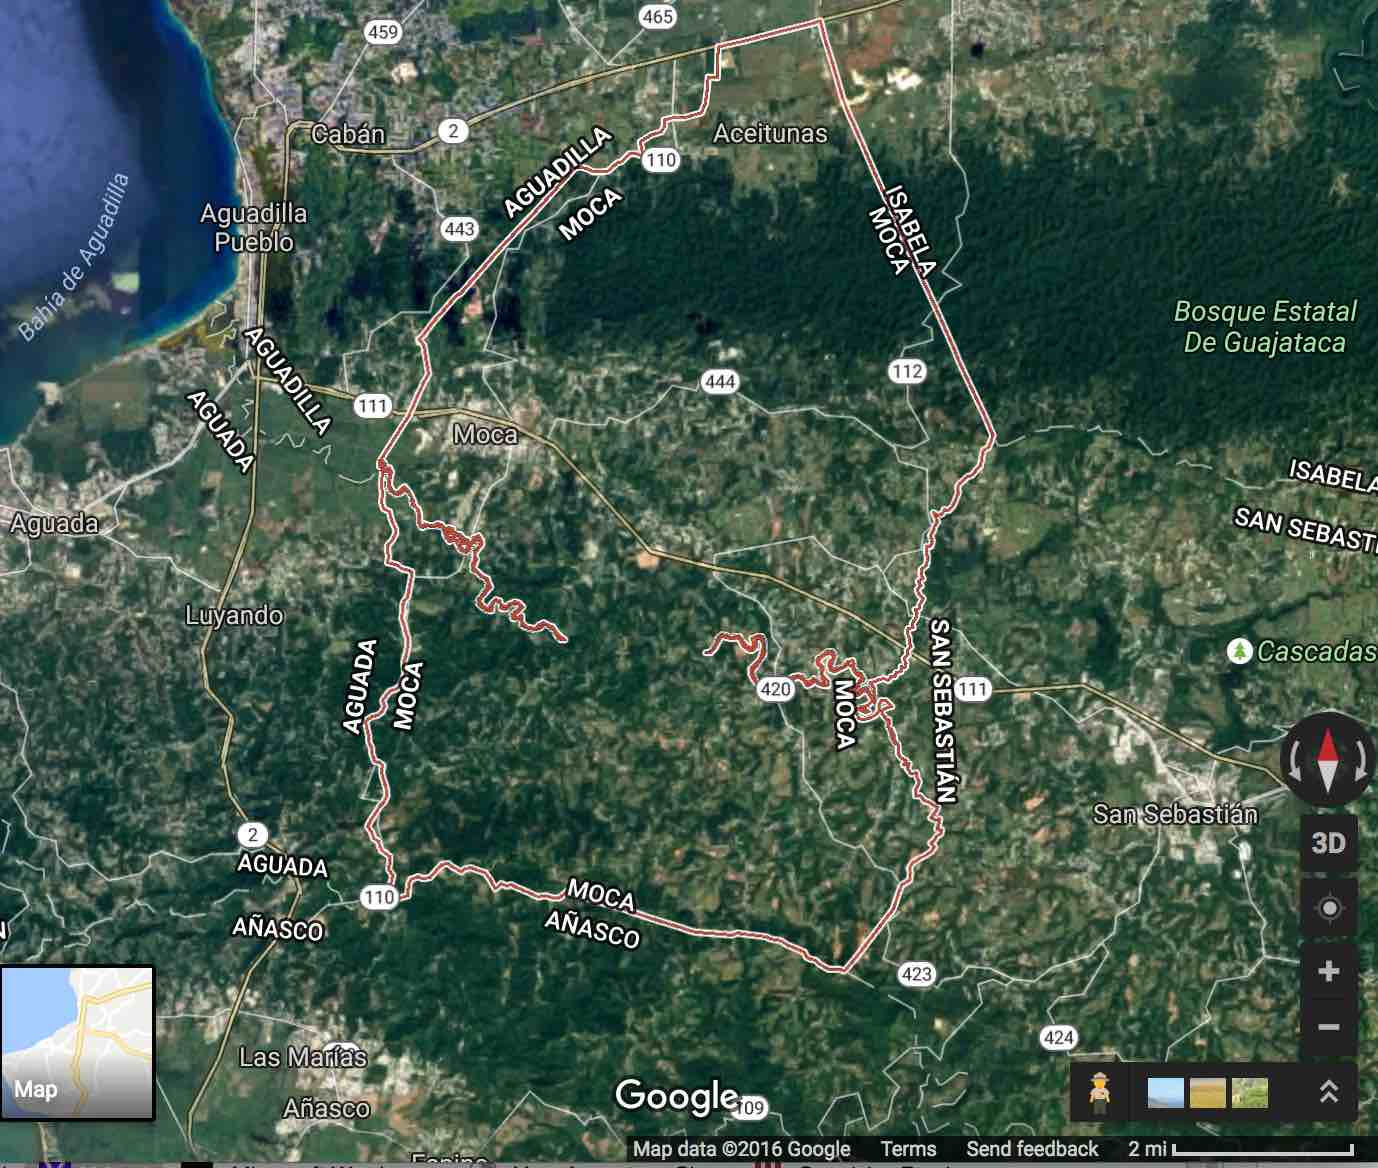 Moca Google Maps 2016Contrast the outline of